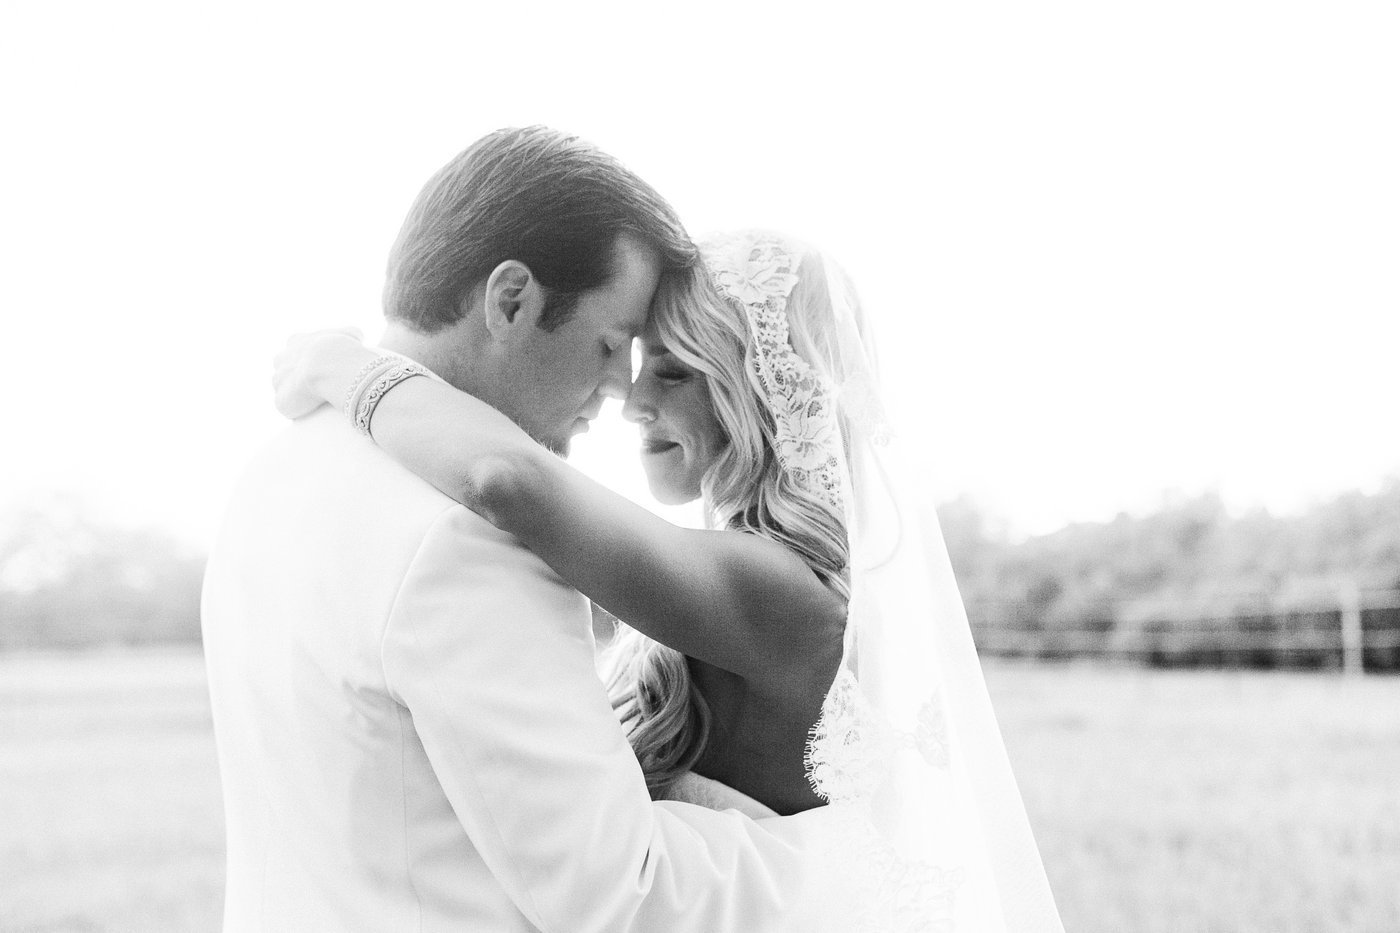 photo-bride-groom-bw